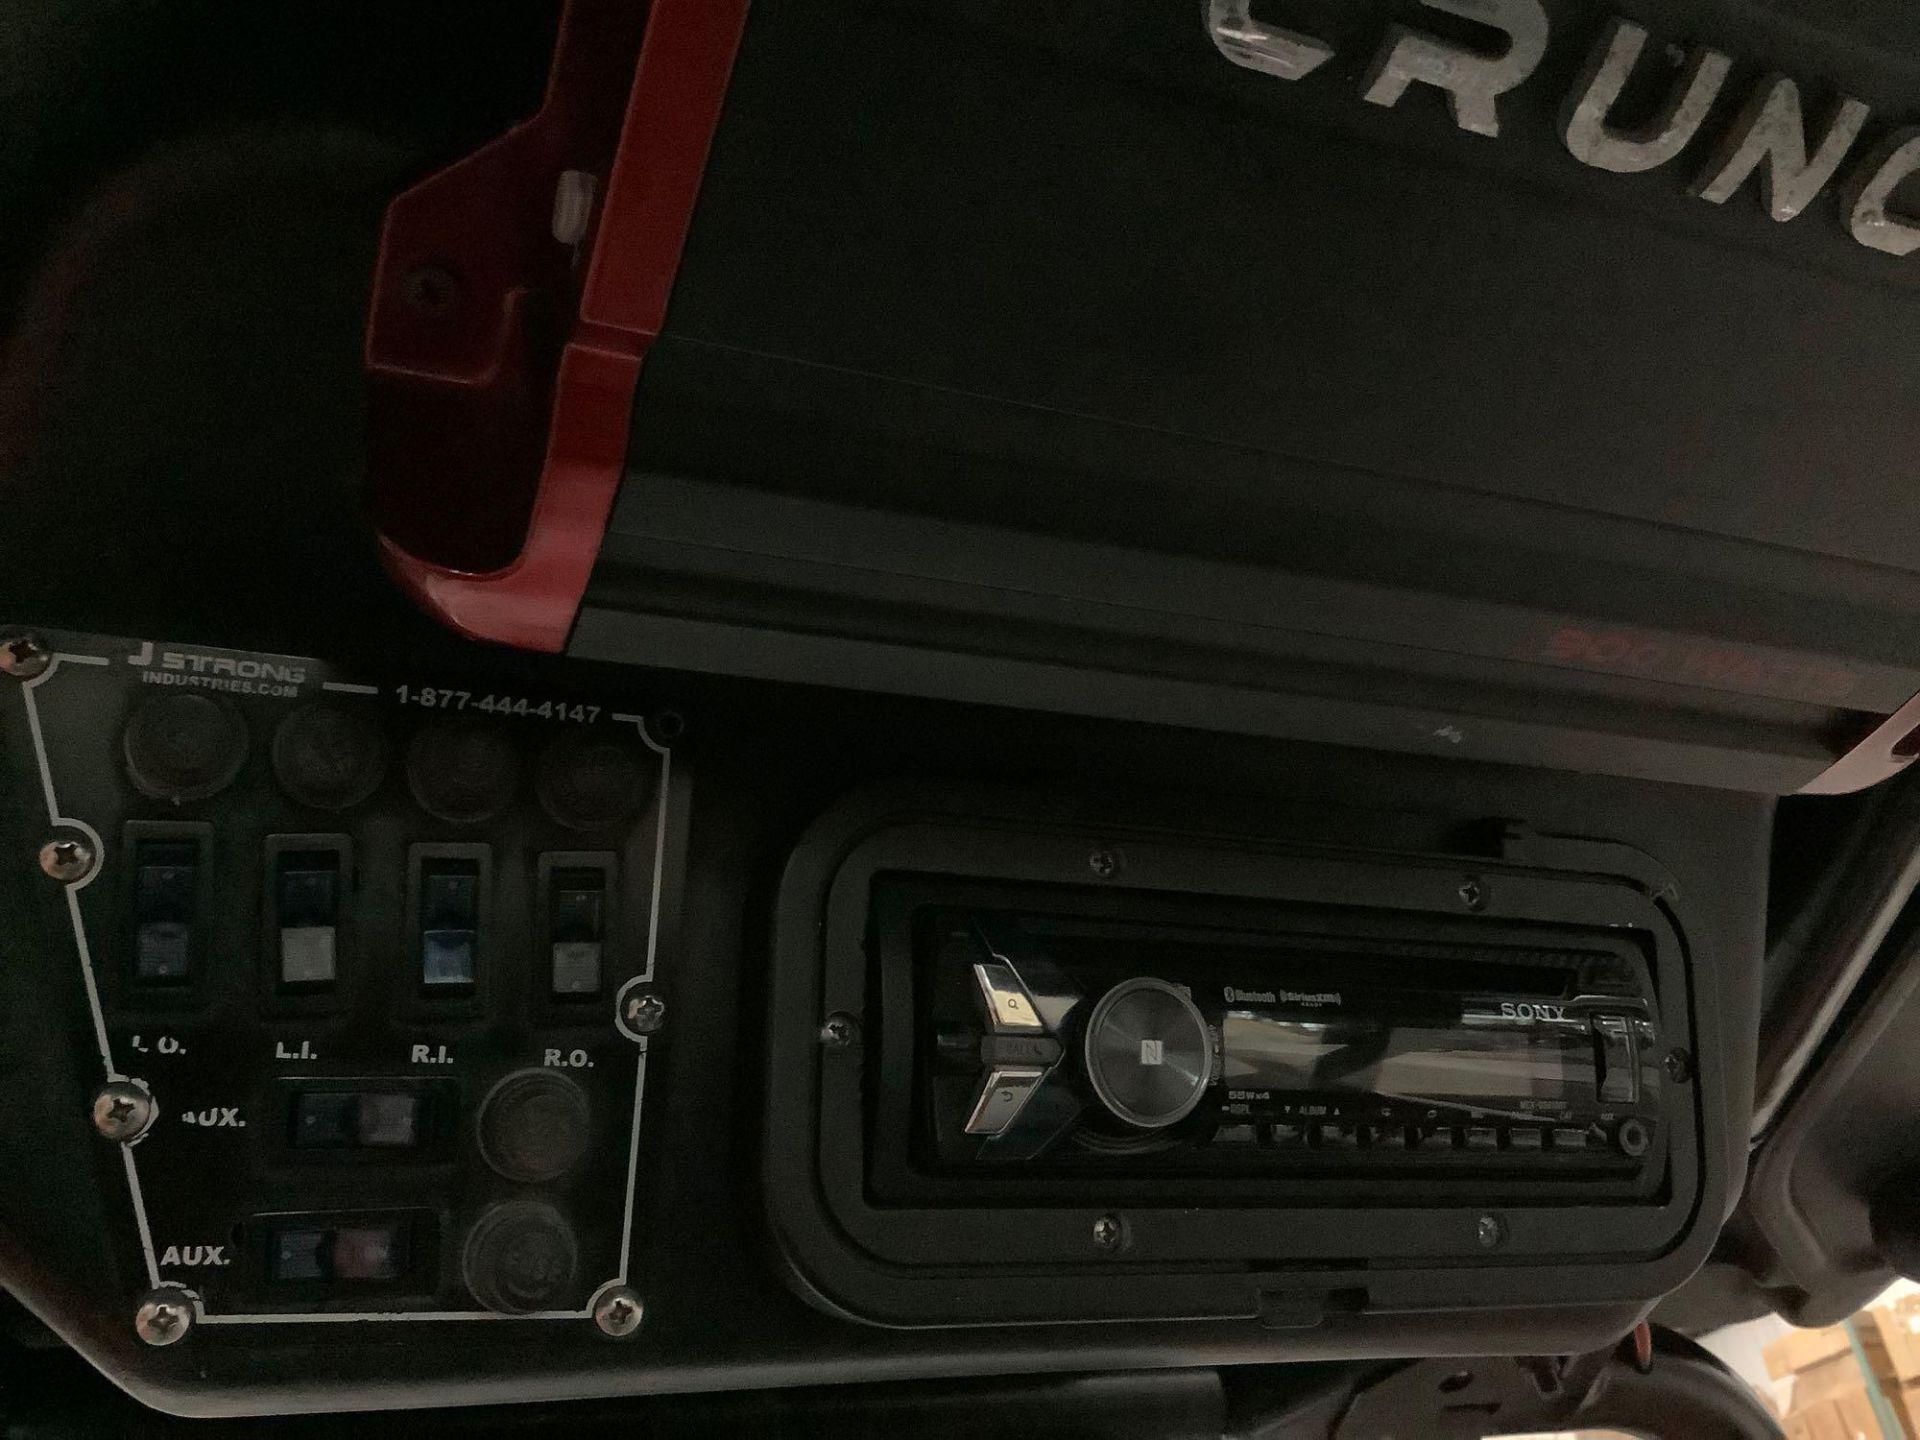 POLARIS RANGER RZR XP 900, TRINITY STAGE 5 RACING MUFFLER, SNORKEL INTAKE, CRUNCH 900 WATTS AMPLIFY - Image 15 of 22